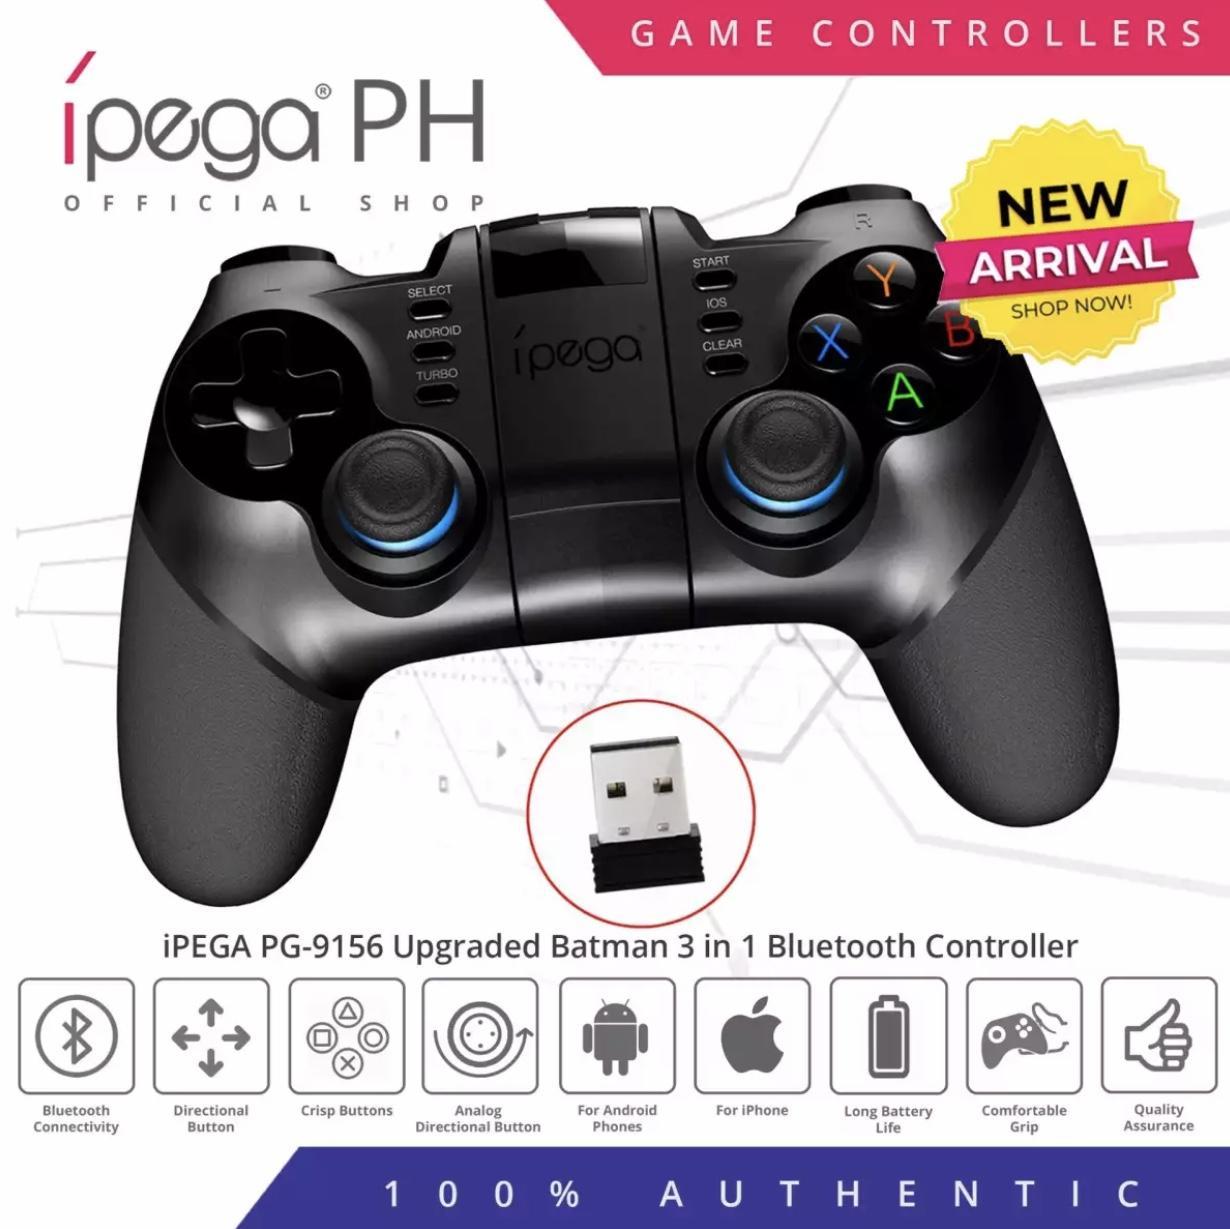 iPega PG-9156 Upgraded PG-9076 Batman 3 in 1 Bluetooth Controller